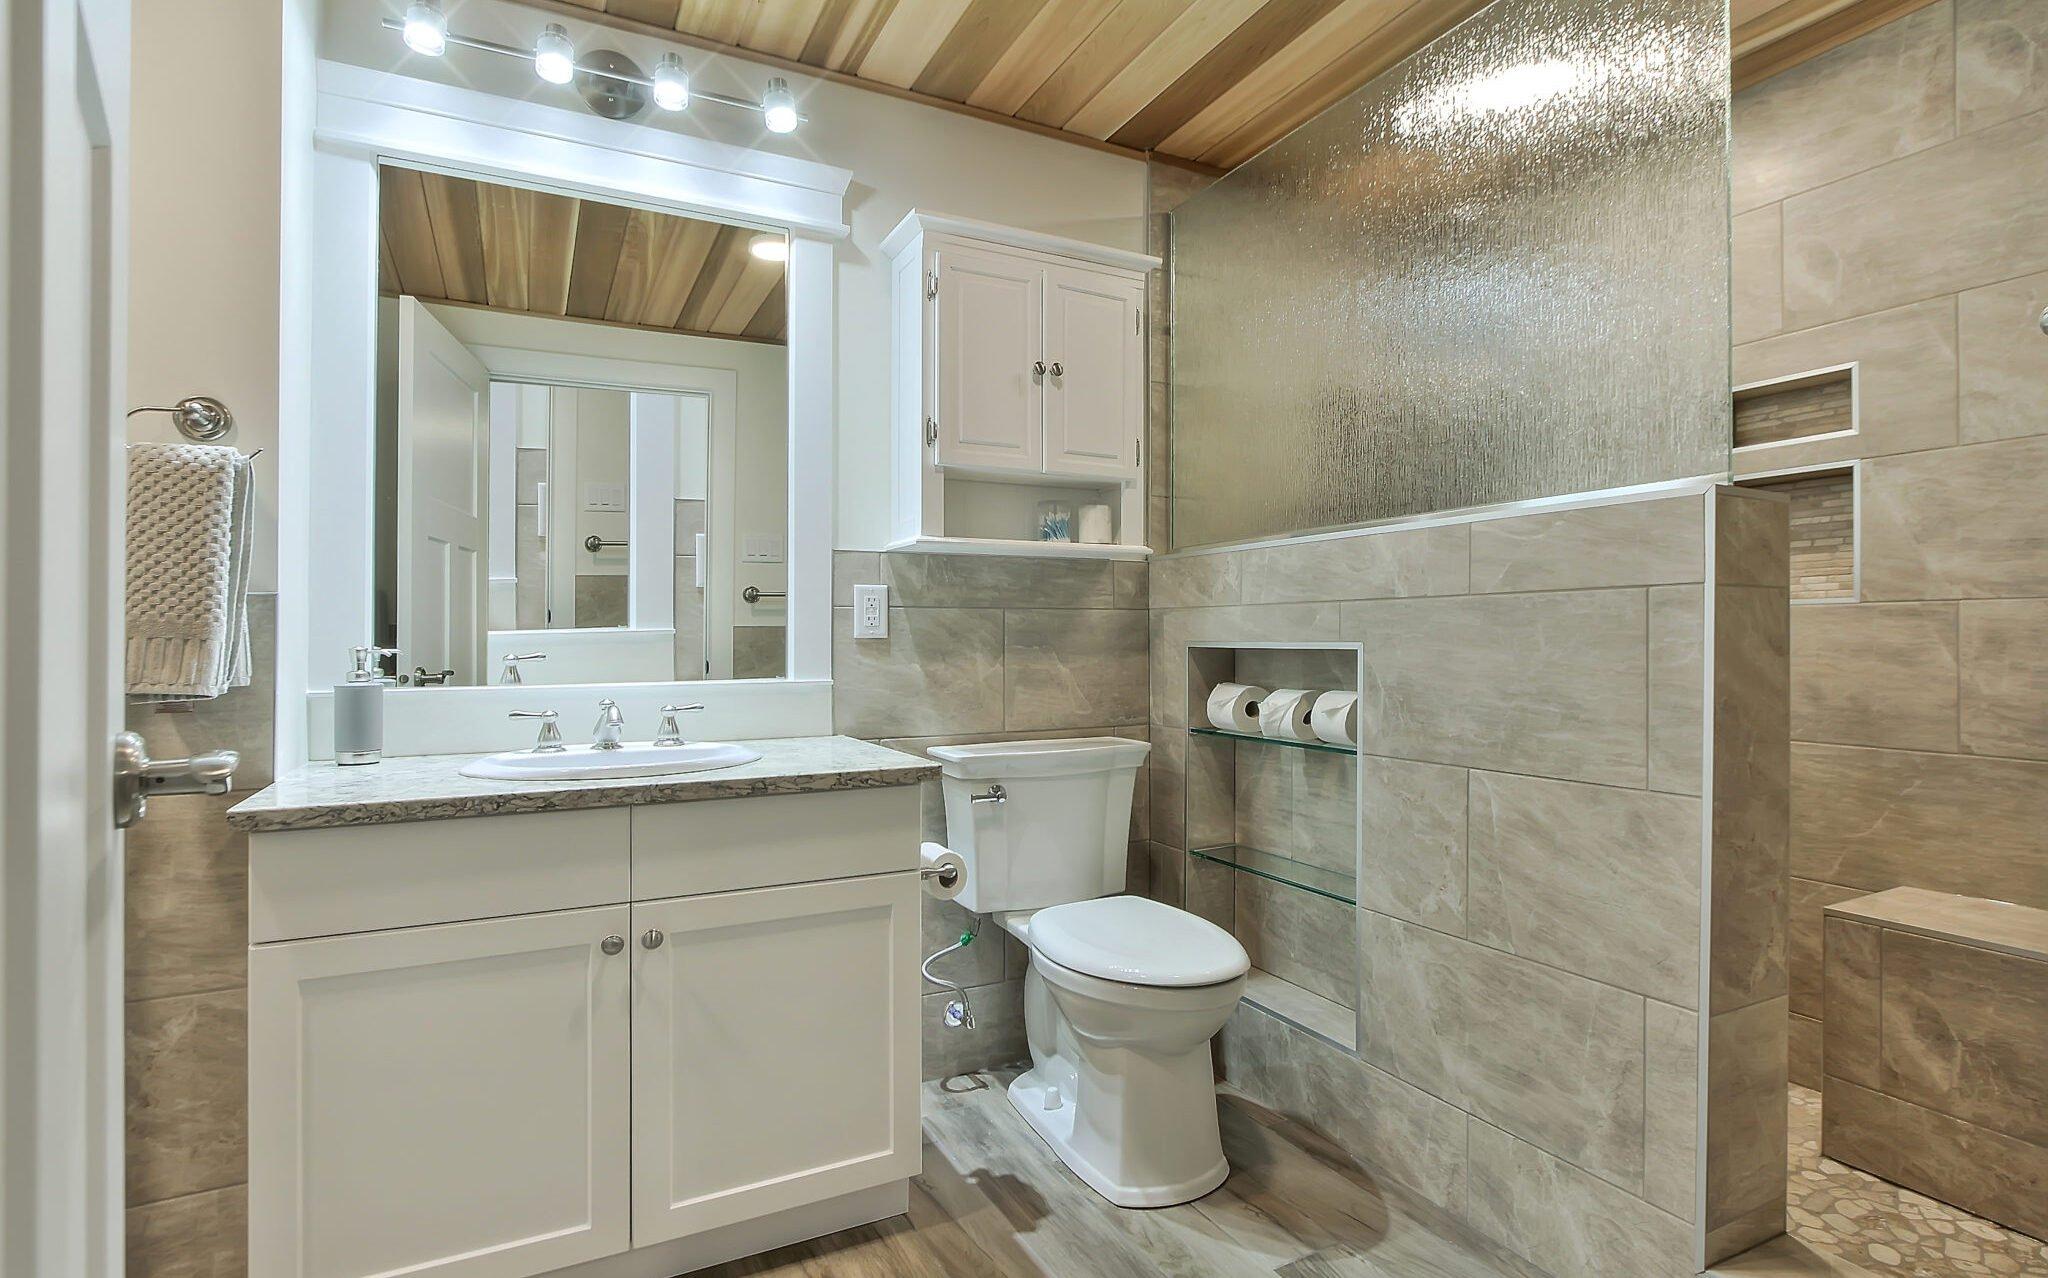 Bathroom Renovations Delize Inc Home Renovations In Edmonton Alberta